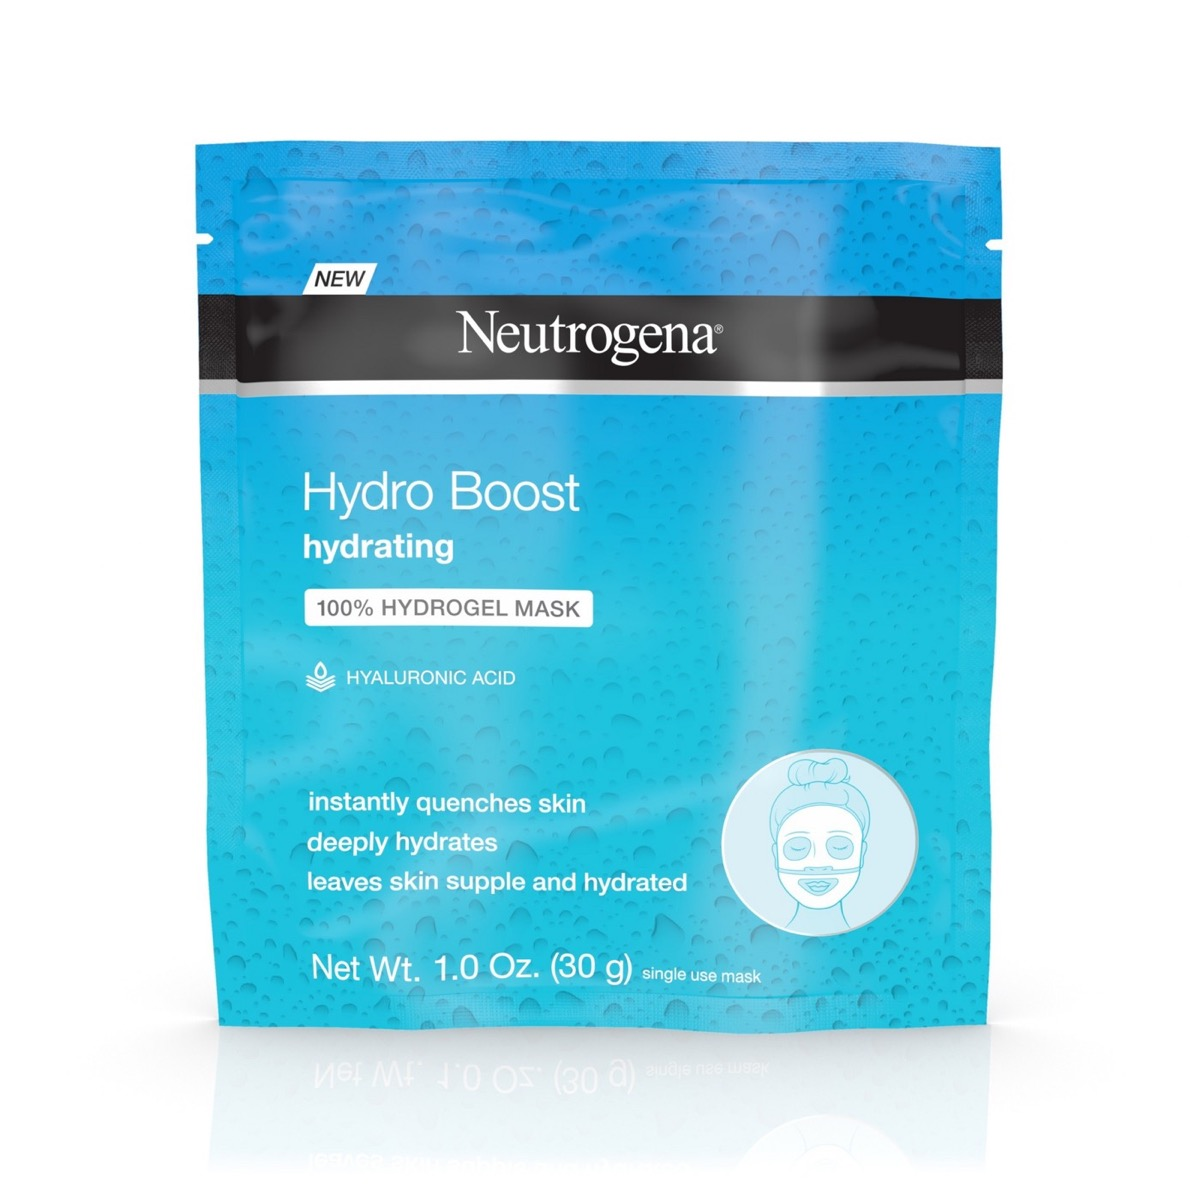 Neutrogena Face Mask {Target Winter Essentials}